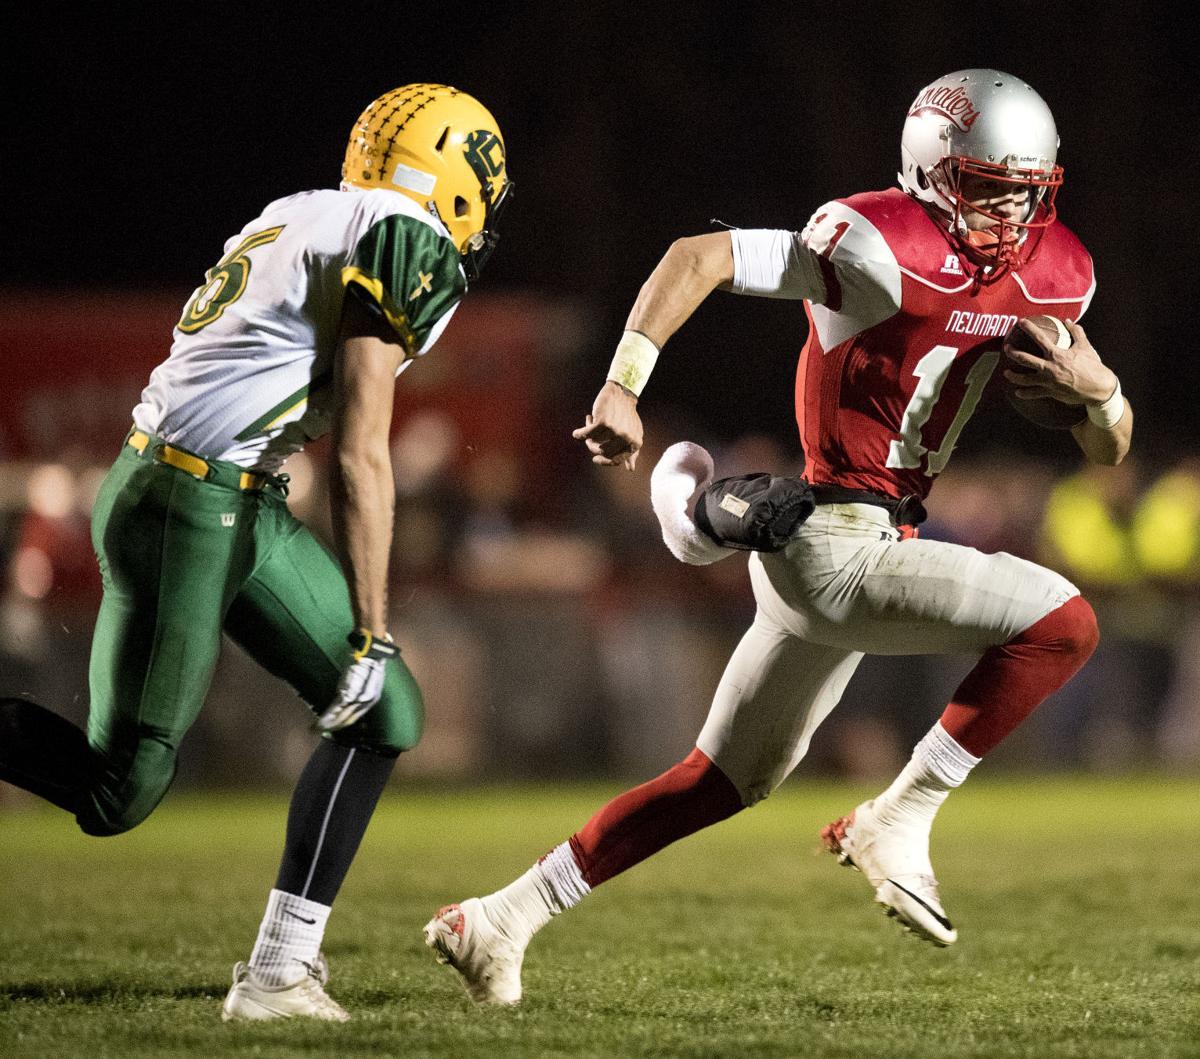 C-1 football, Kearney Catholic vs. Bishop Neumann, 11/11